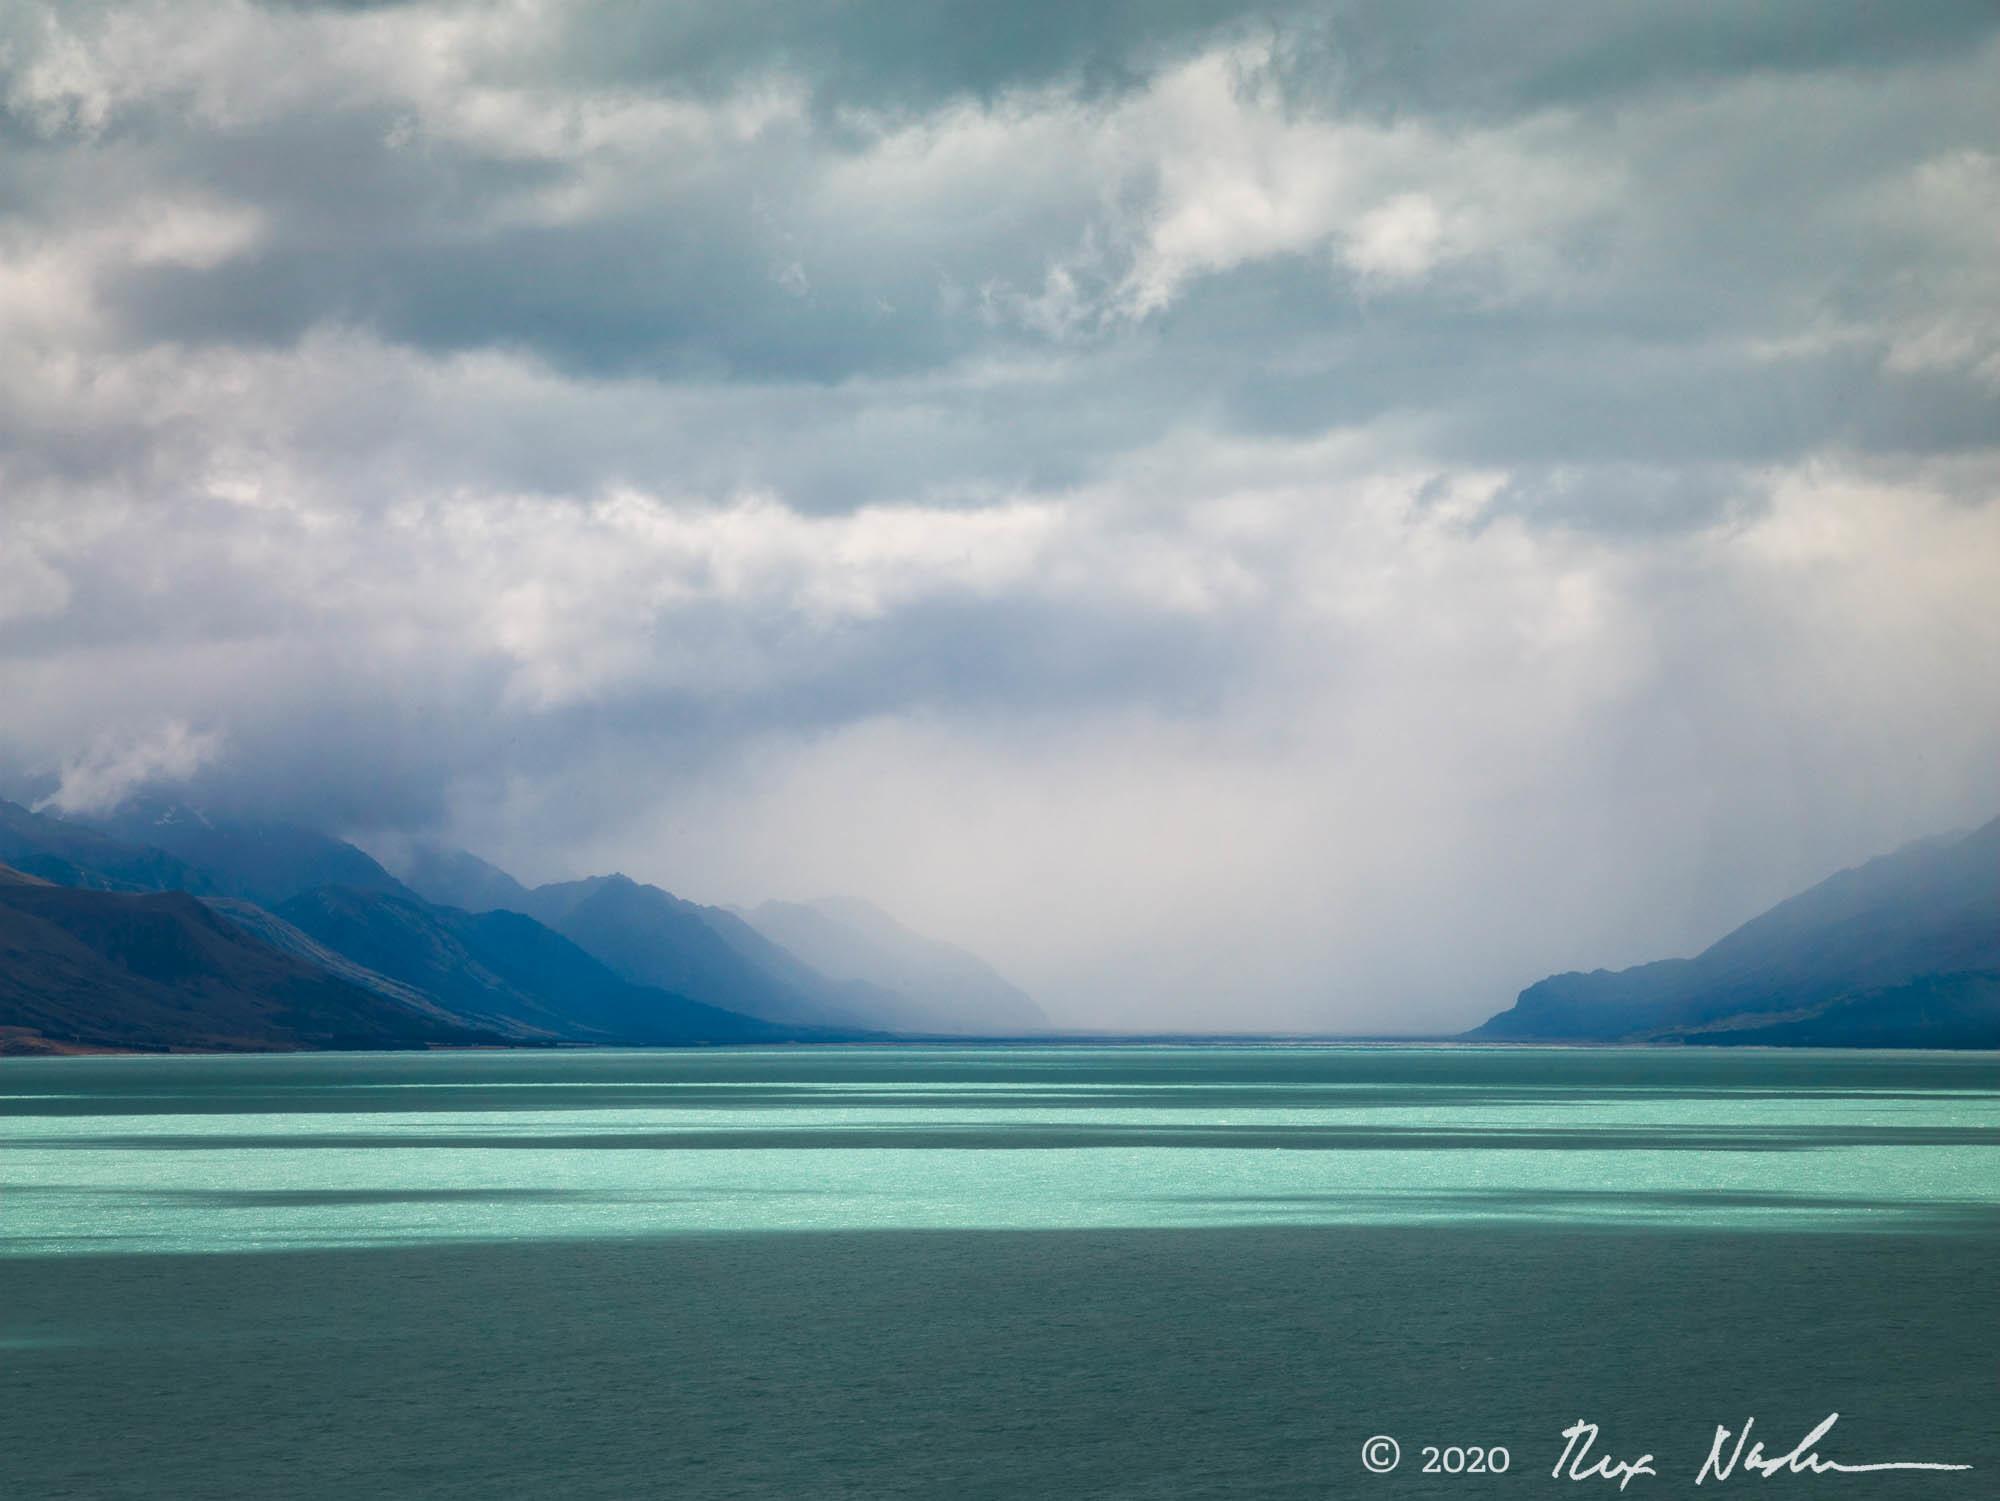 Storm, Lake Tekapo - South Island, New Zealand